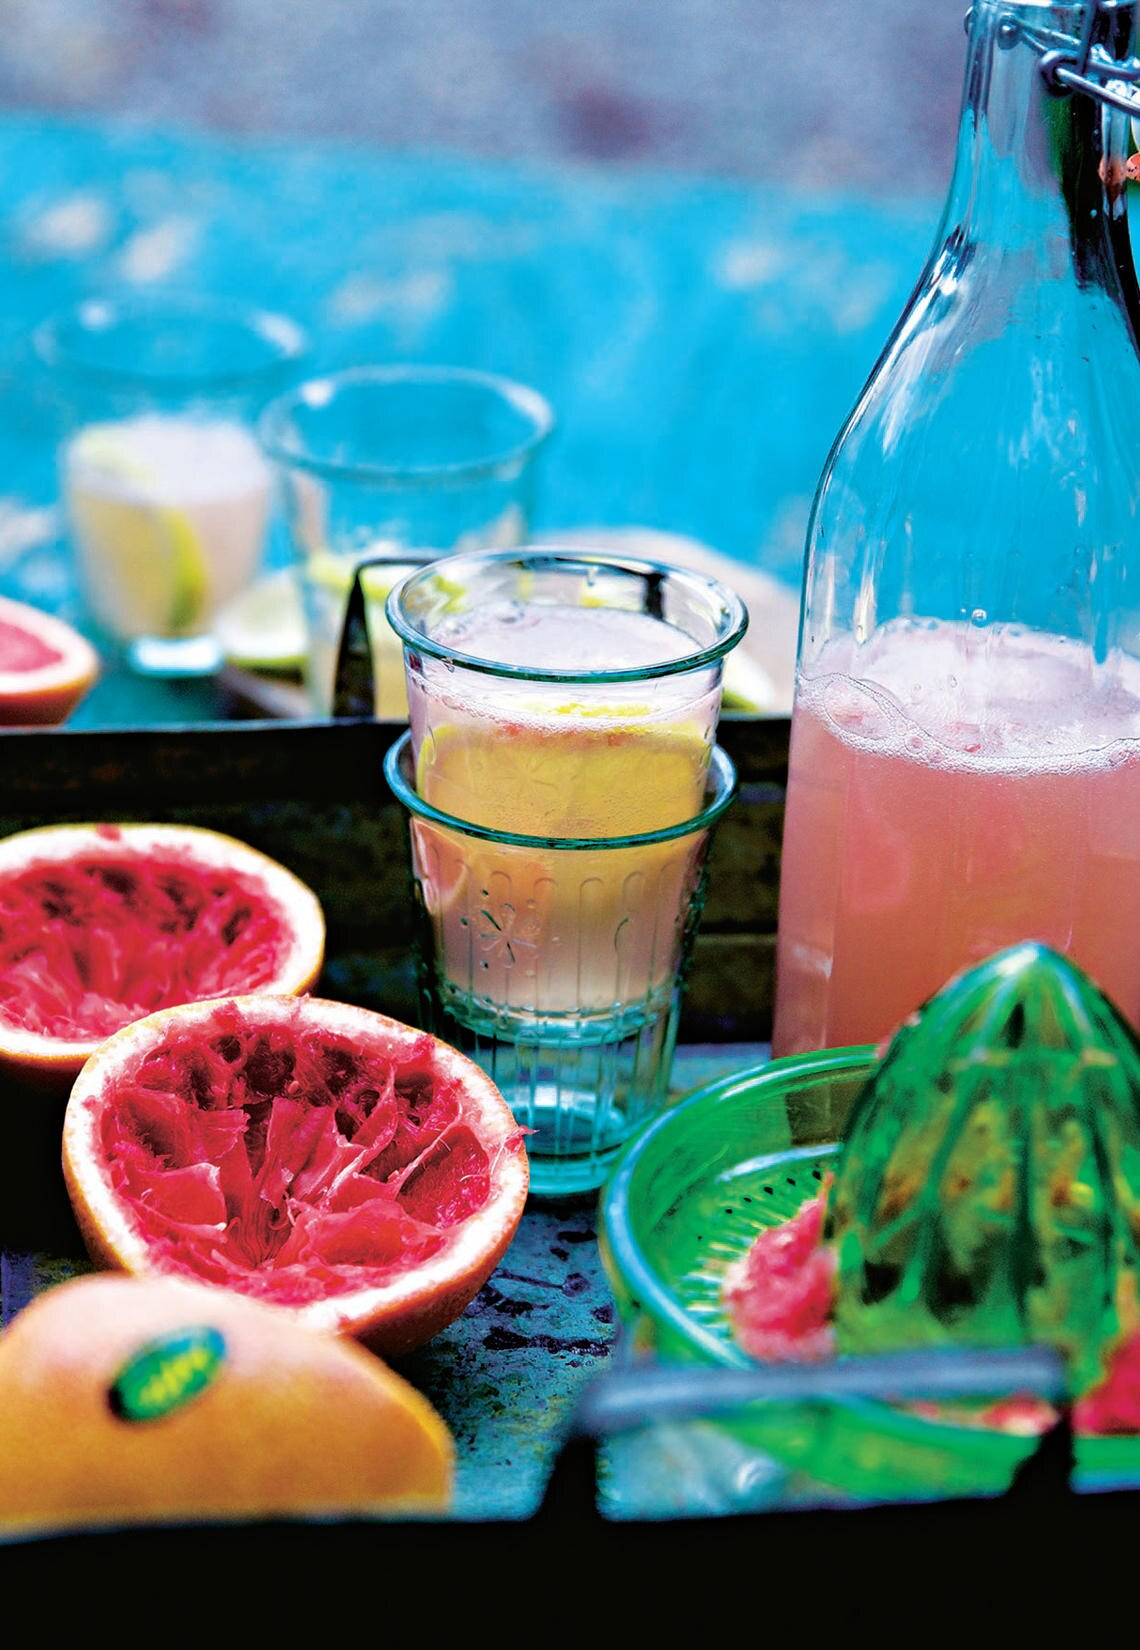 Grapefruit-Limonade